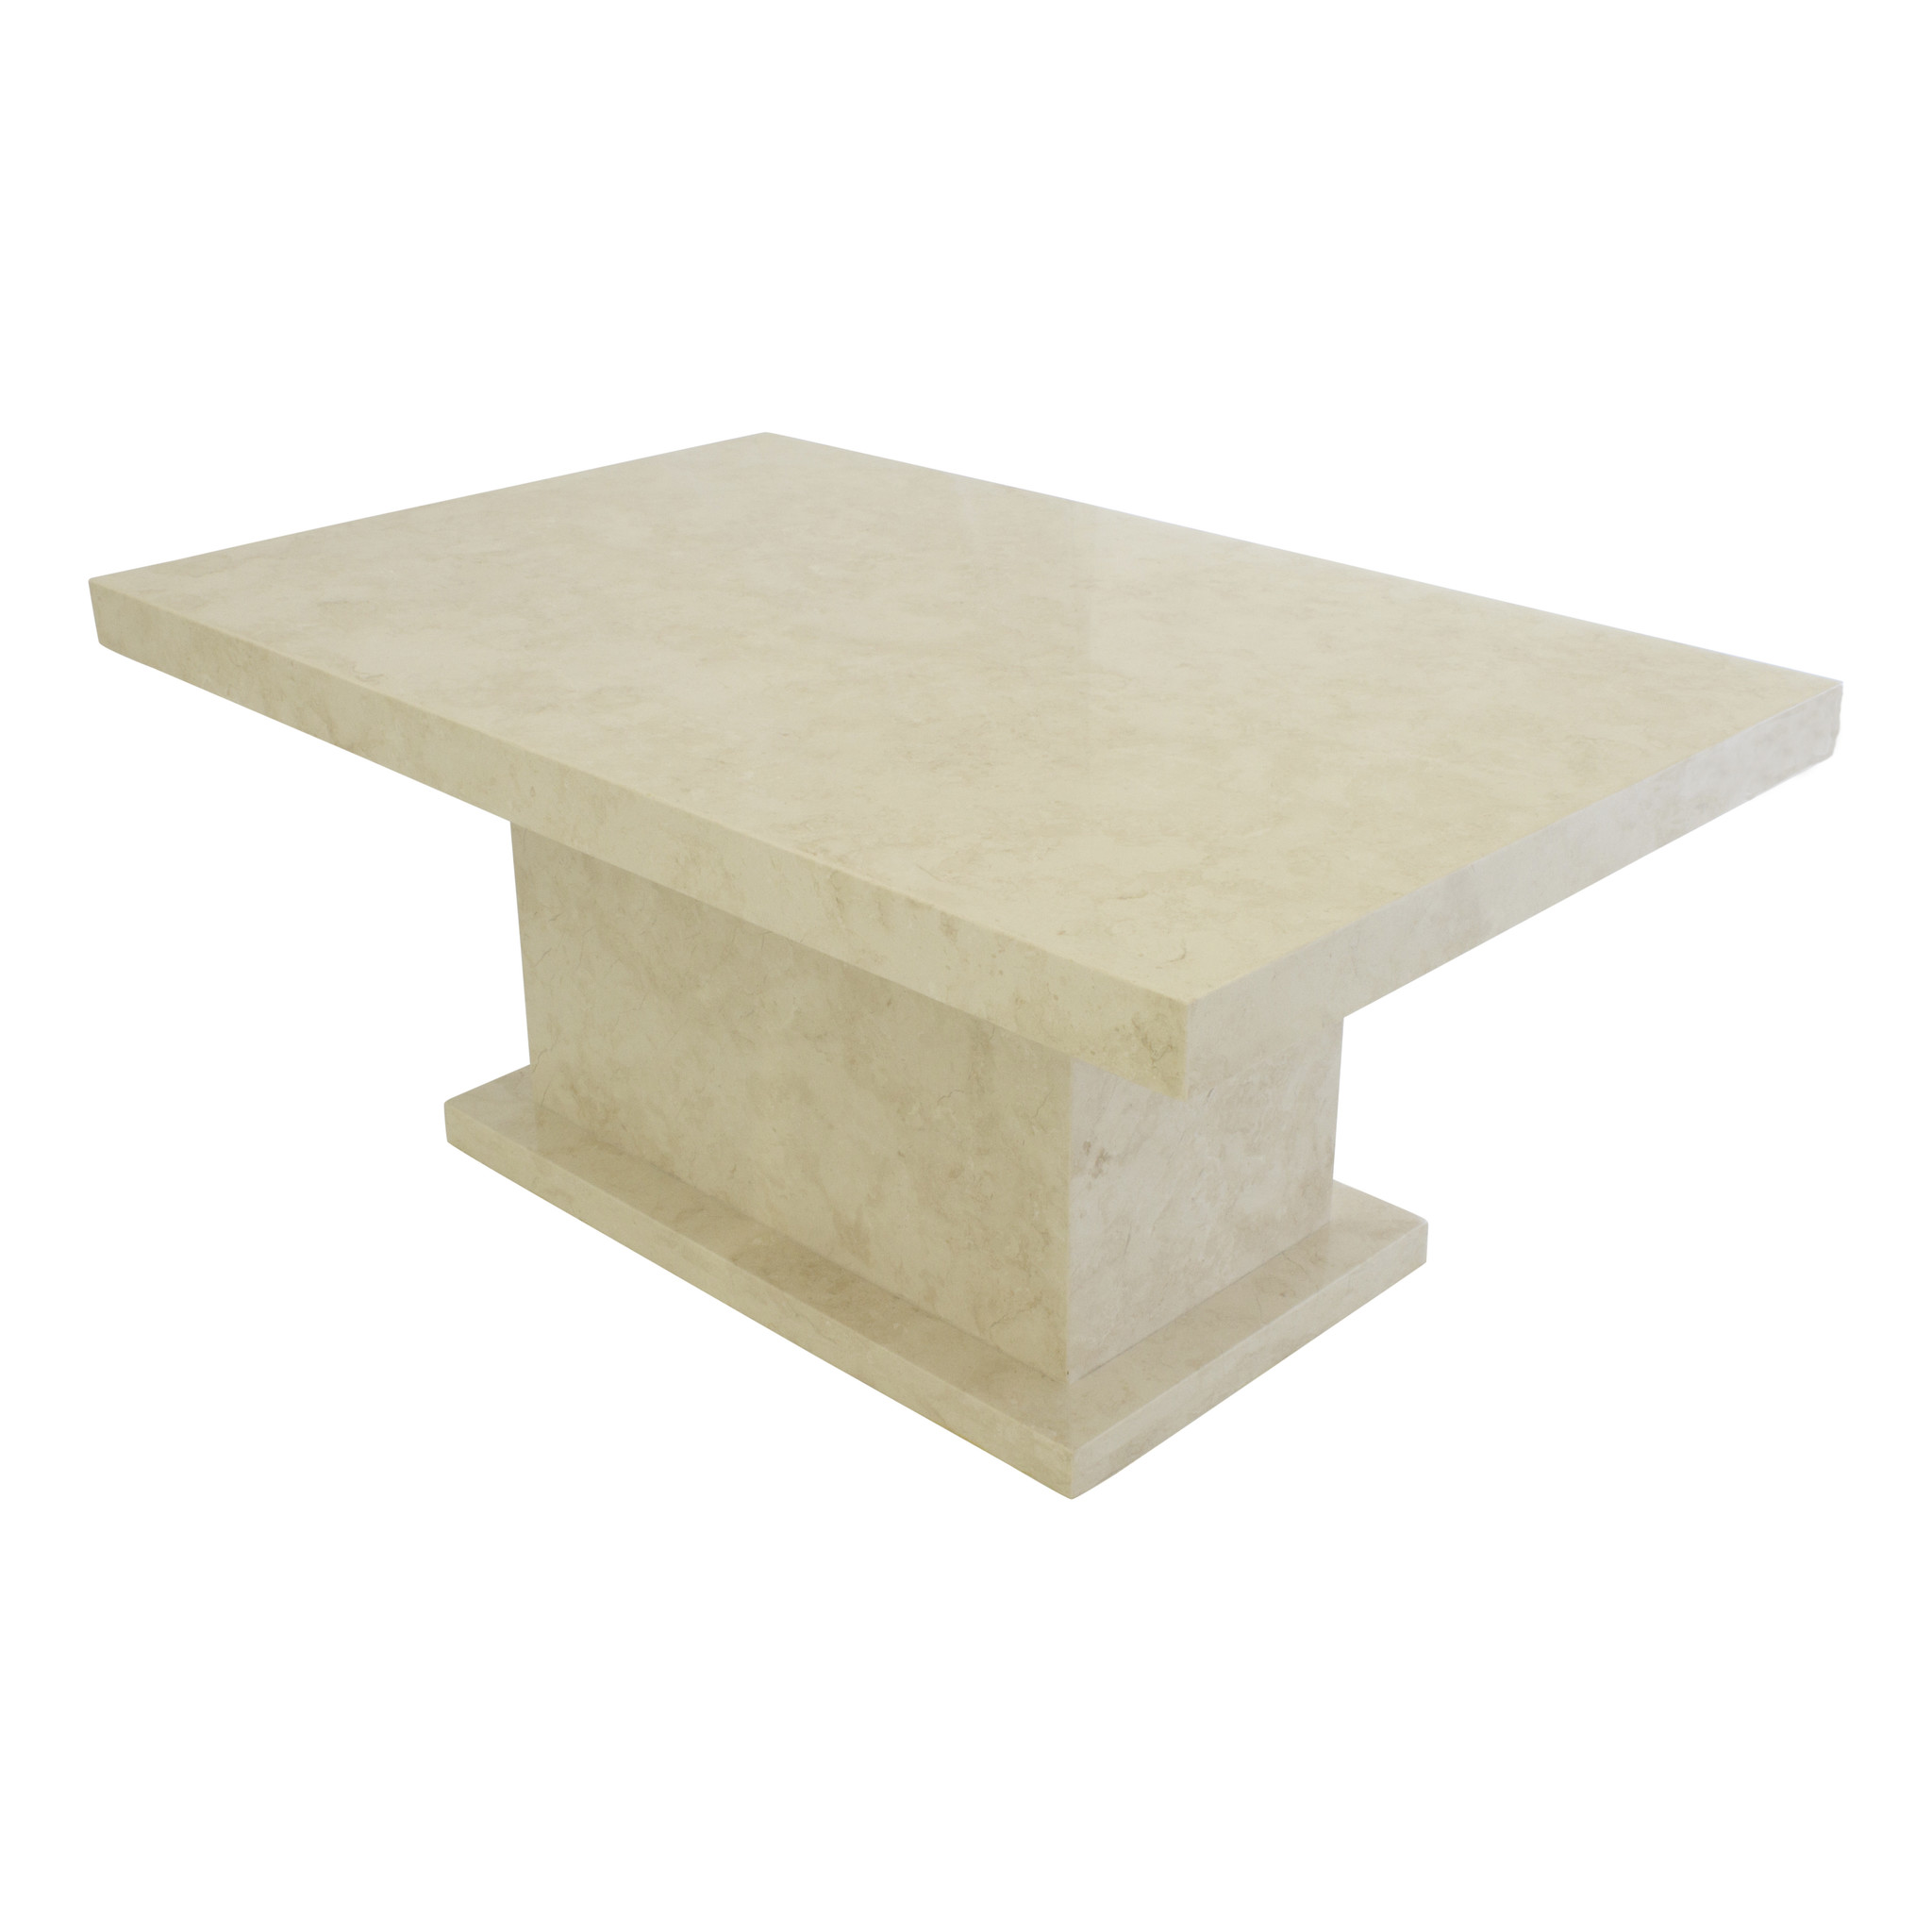 Indomarmer Coffee table Rectangle 110x70x45 cm Cream Marble